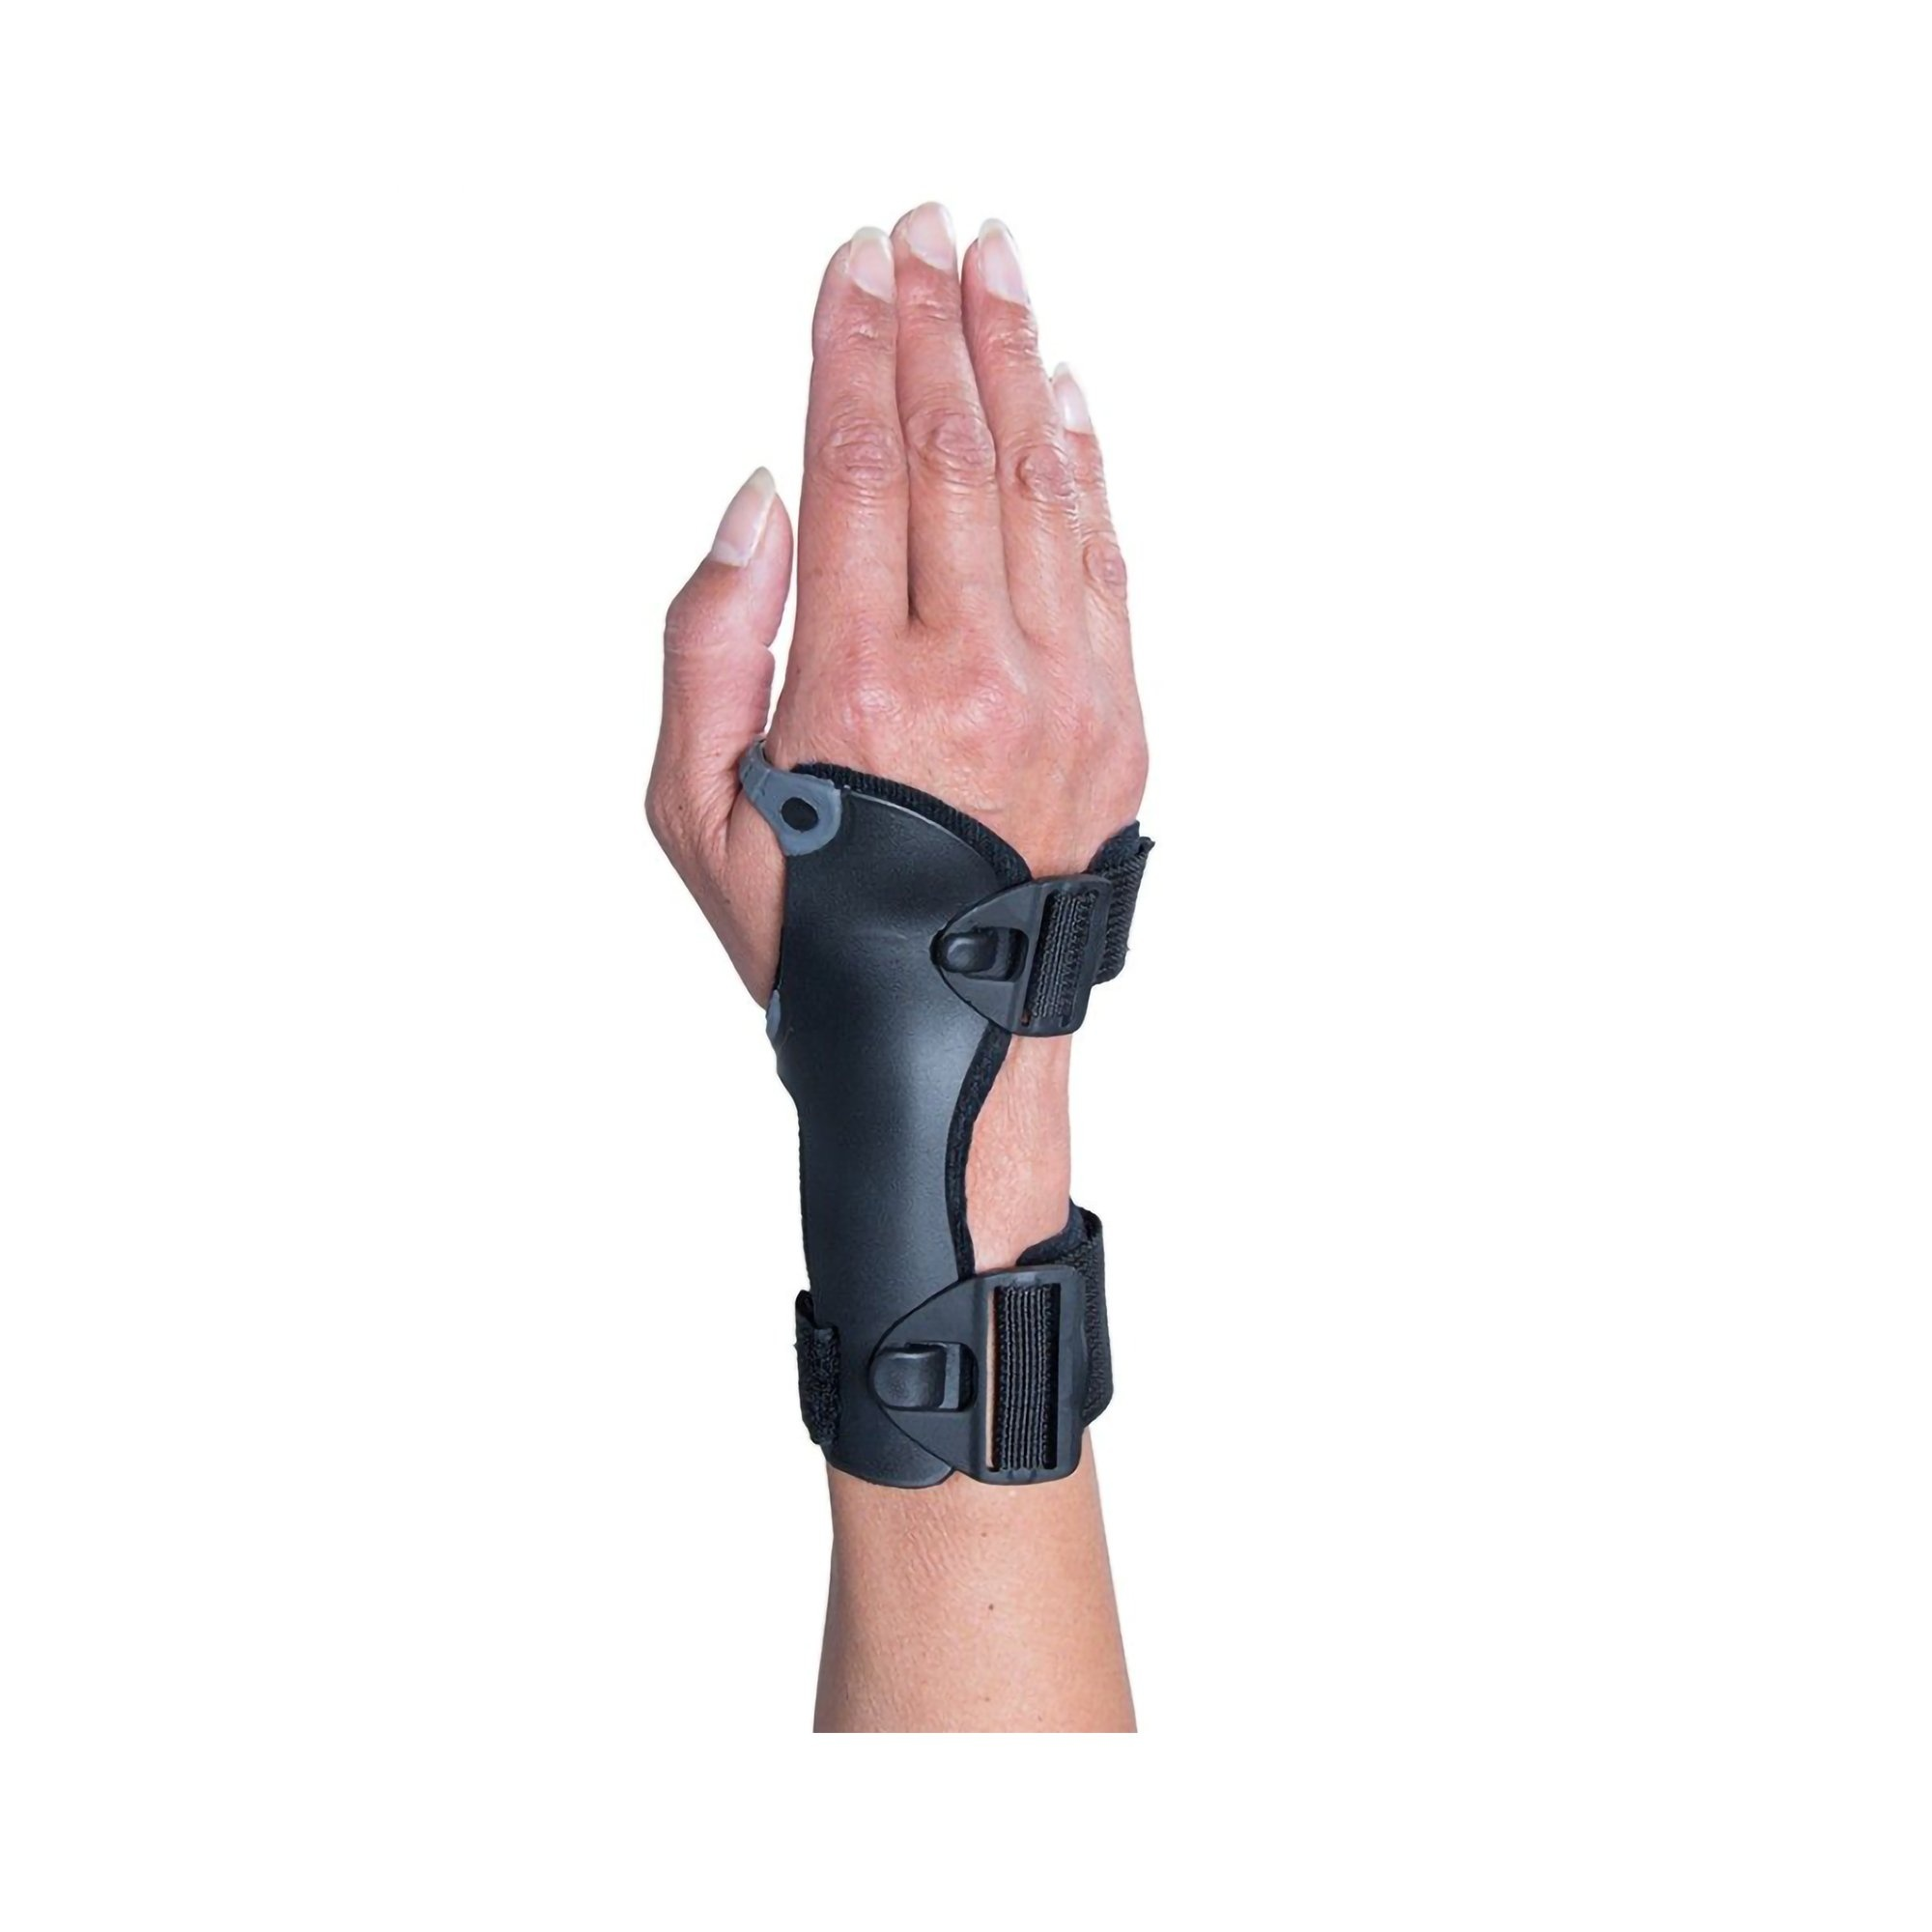 "Ossur Exoform Right Carpal Tunnel Wrist Support, 517075, Medium (Wrist 6.5-7.75""/Palm 8-9.25"") - 1 Each"